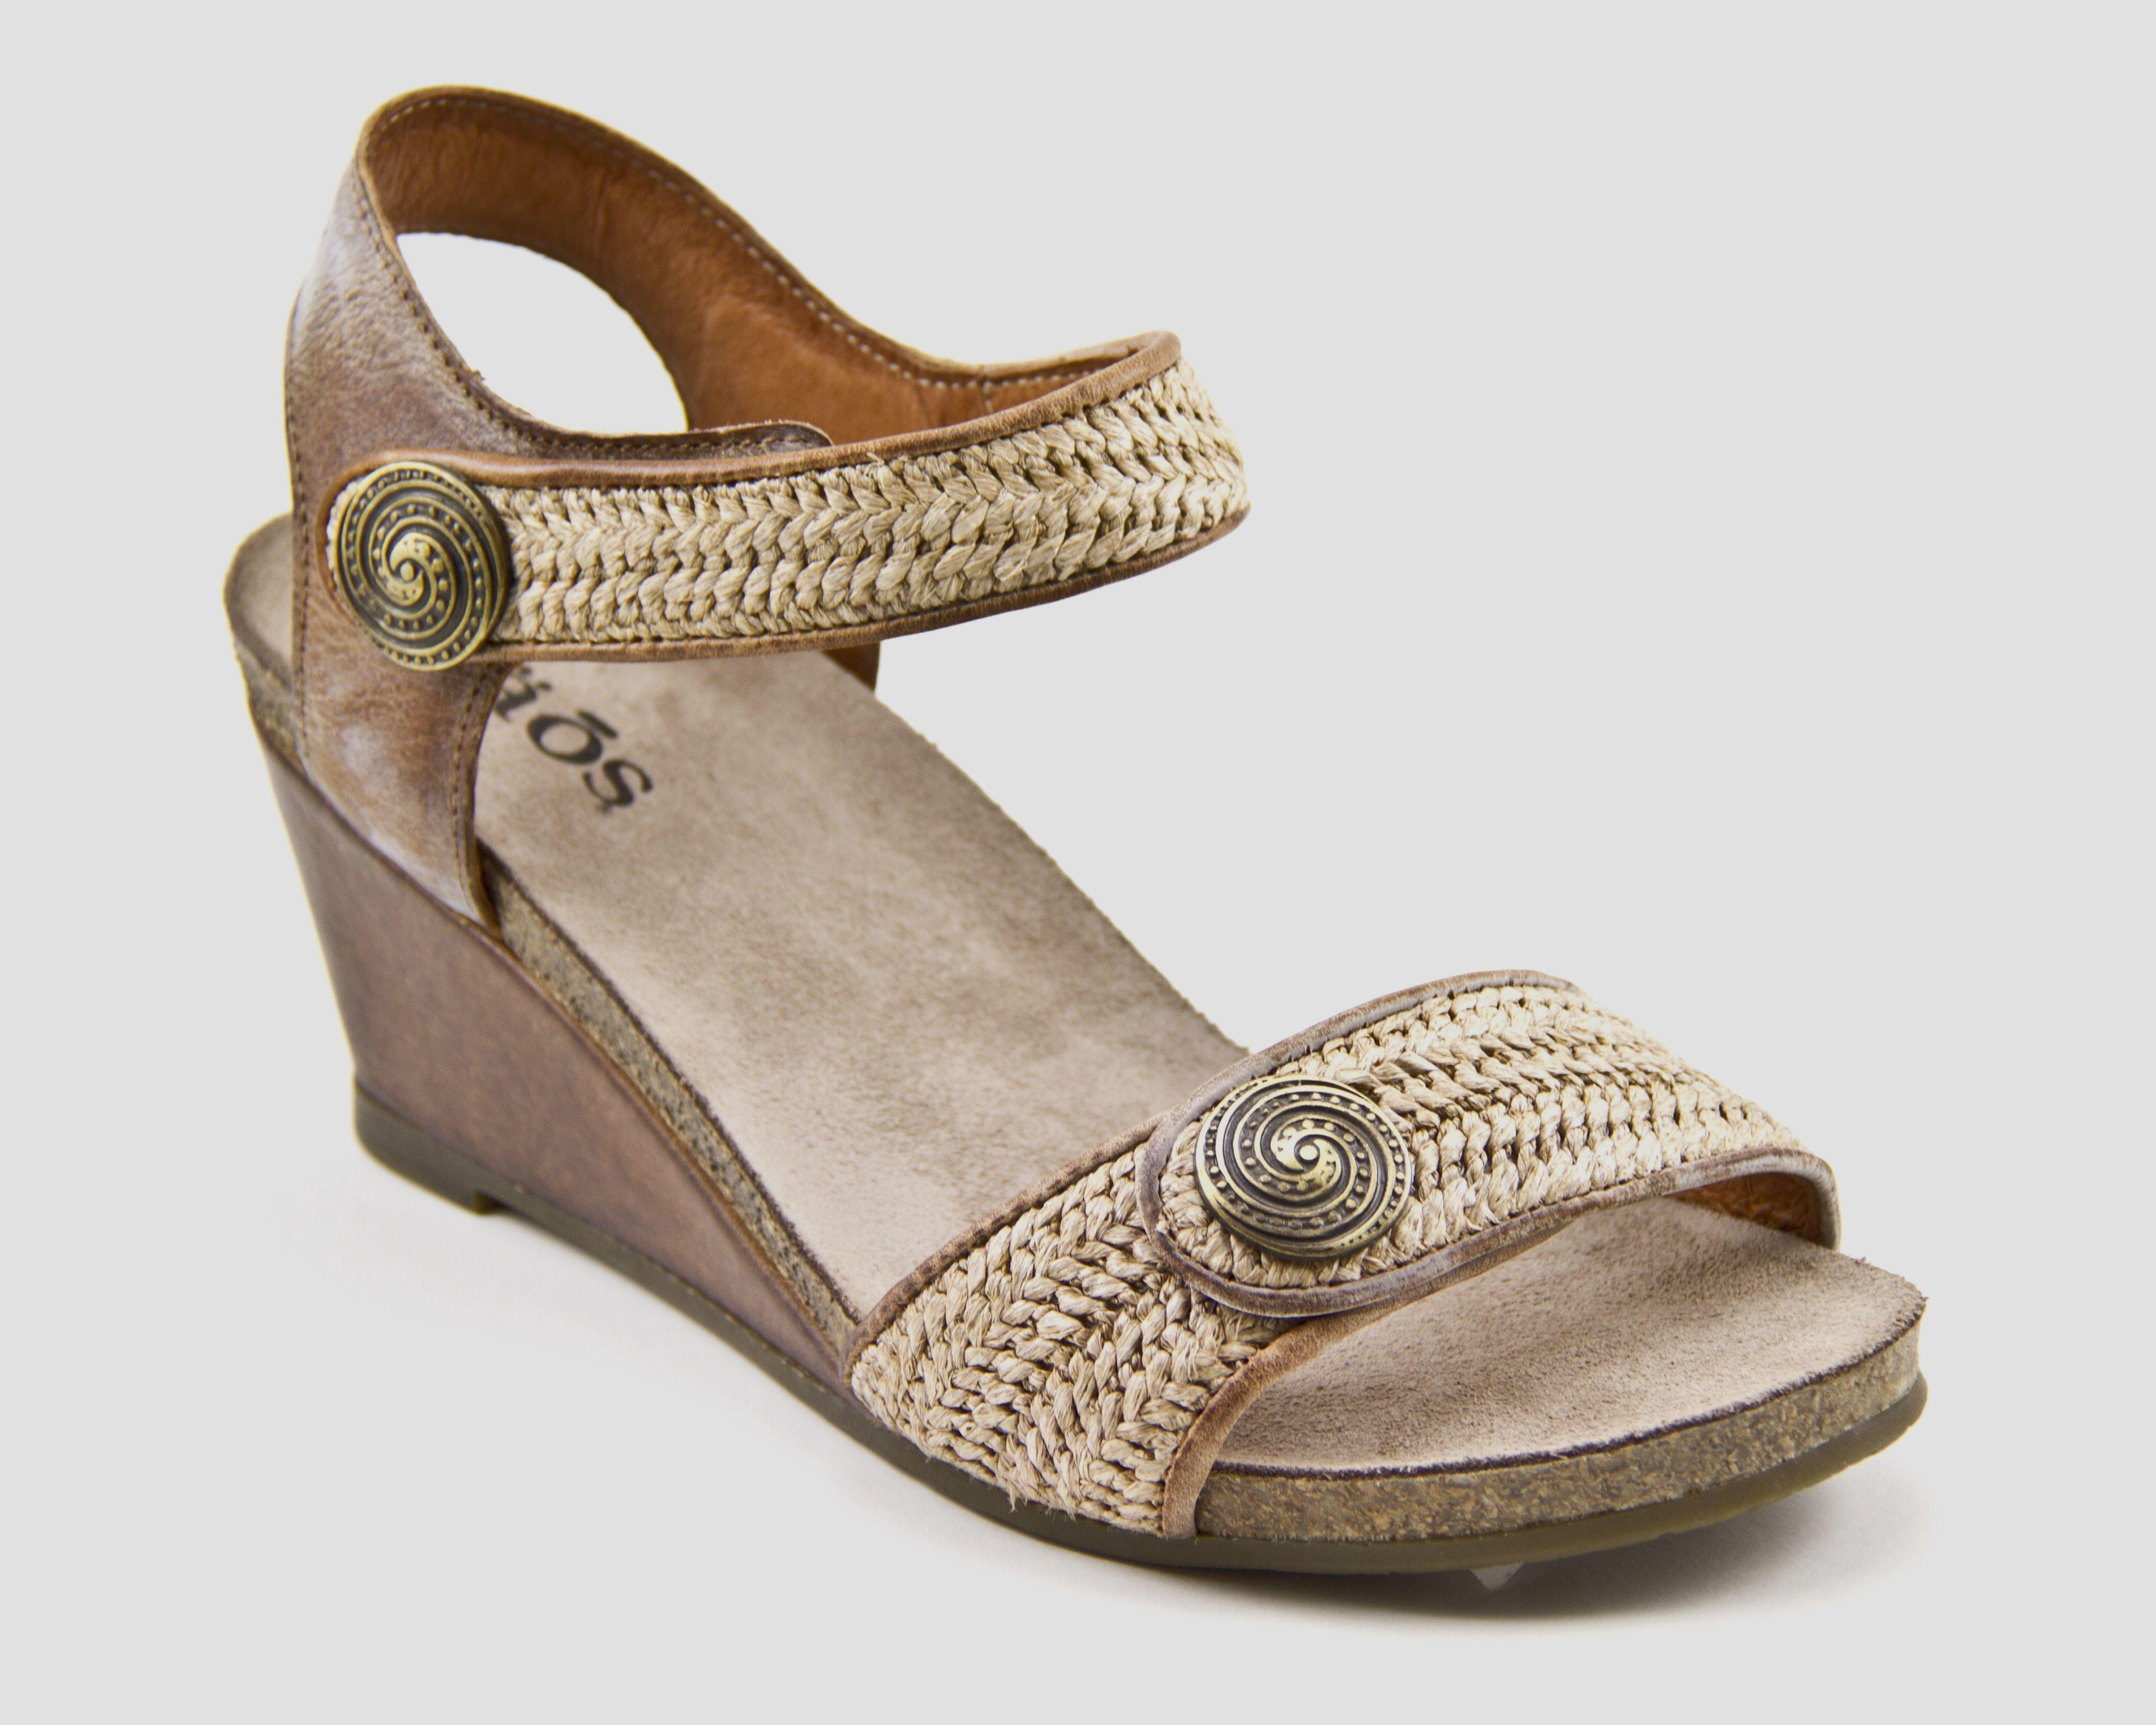 Taos Women's Holiday Wedge Sandal